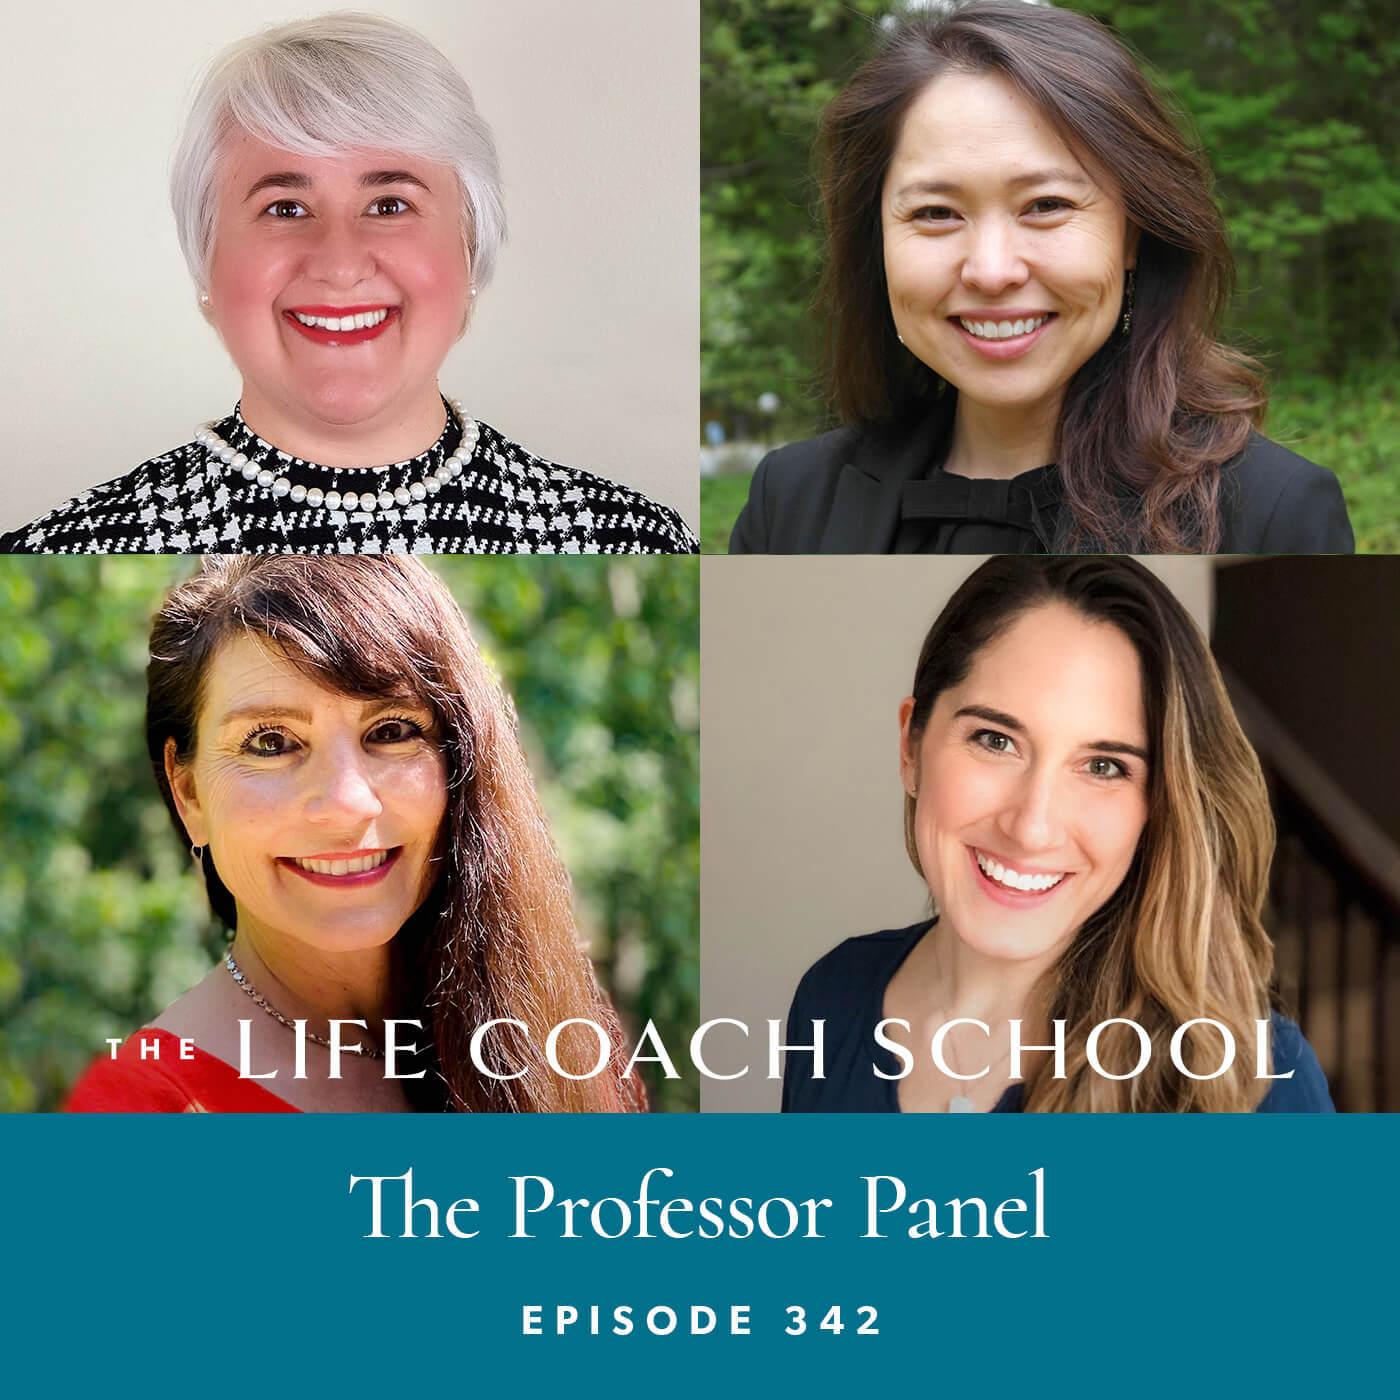 Ep #342: The Professor Panel